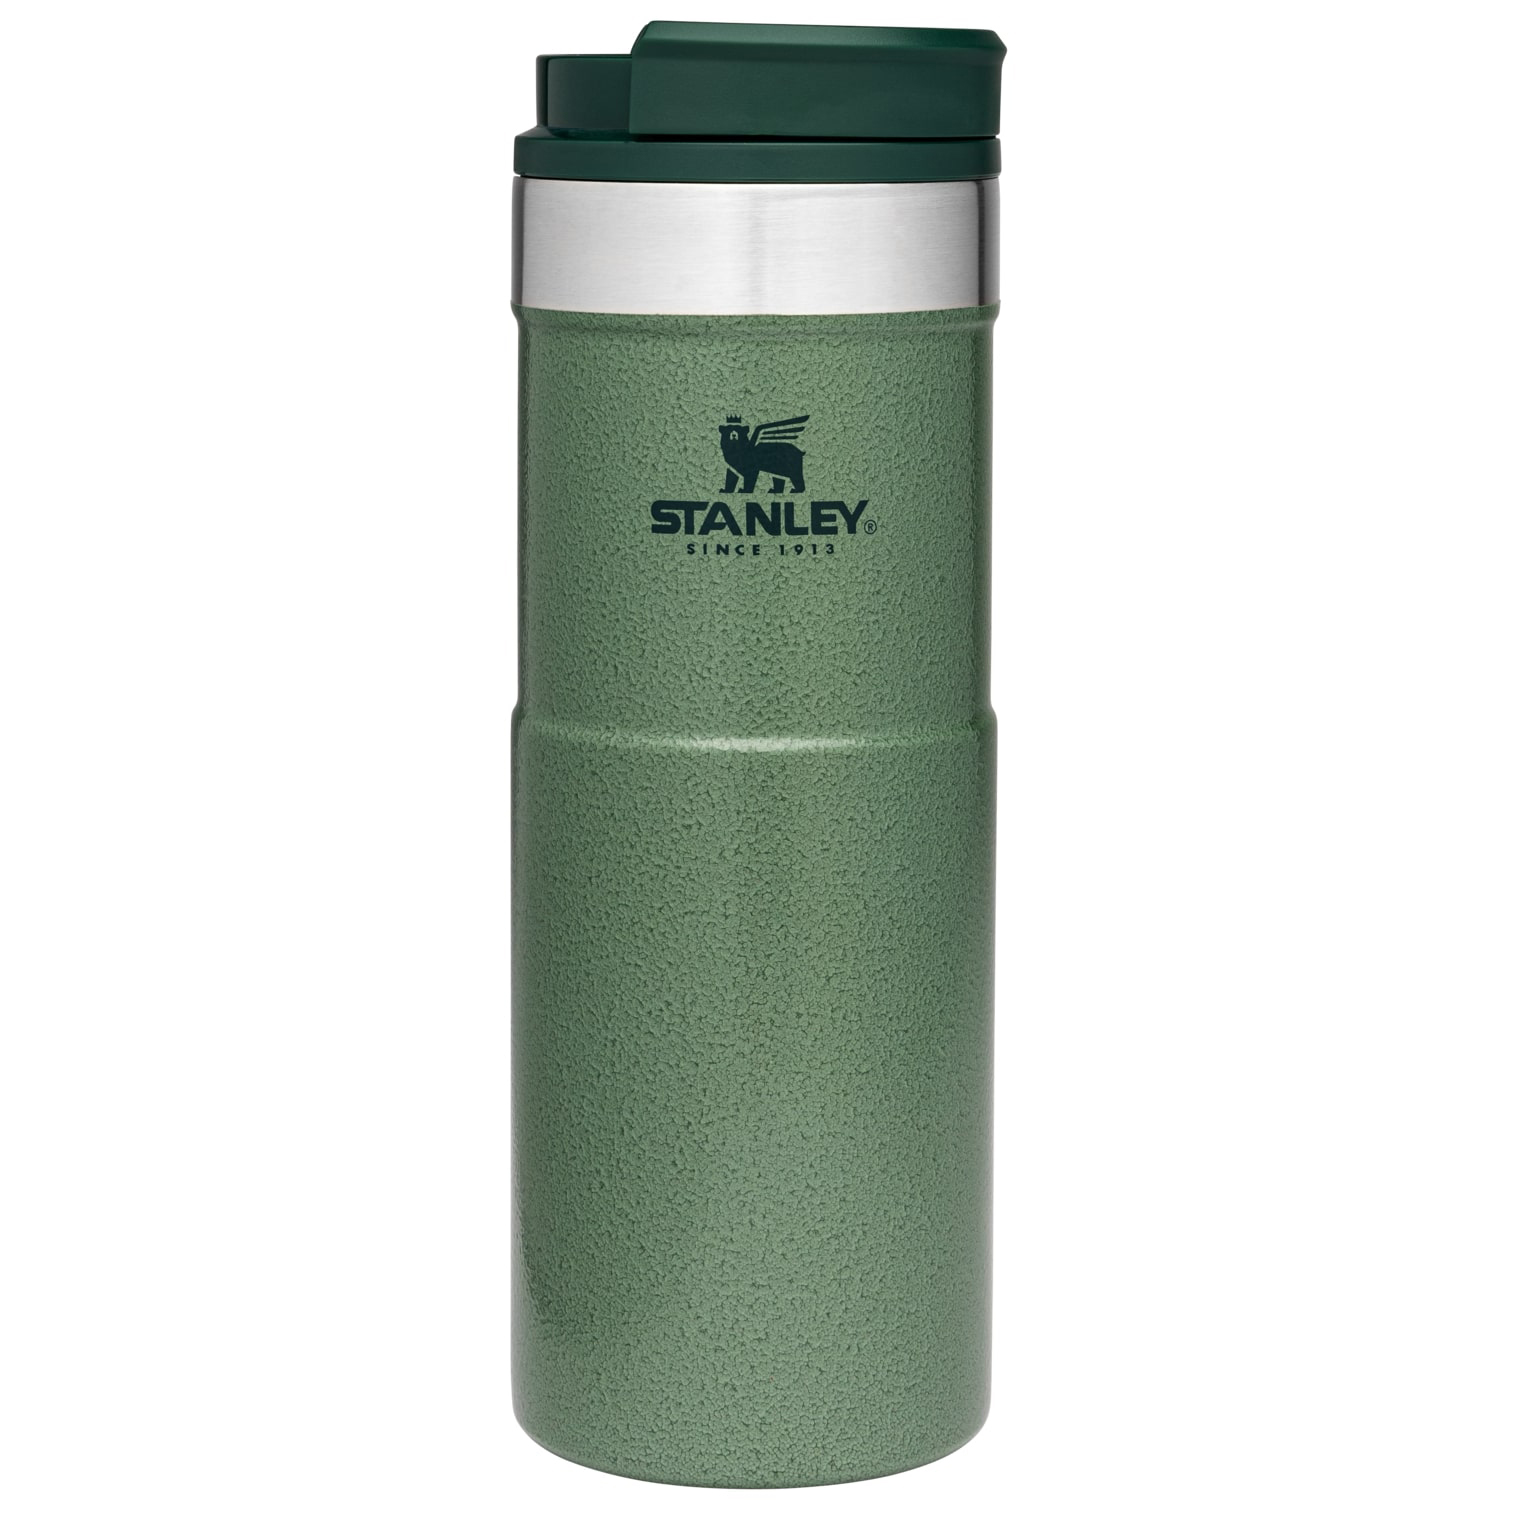 Stanley Classic The NeverLeak Travel Mug 16oz - 0.47L - HM Green